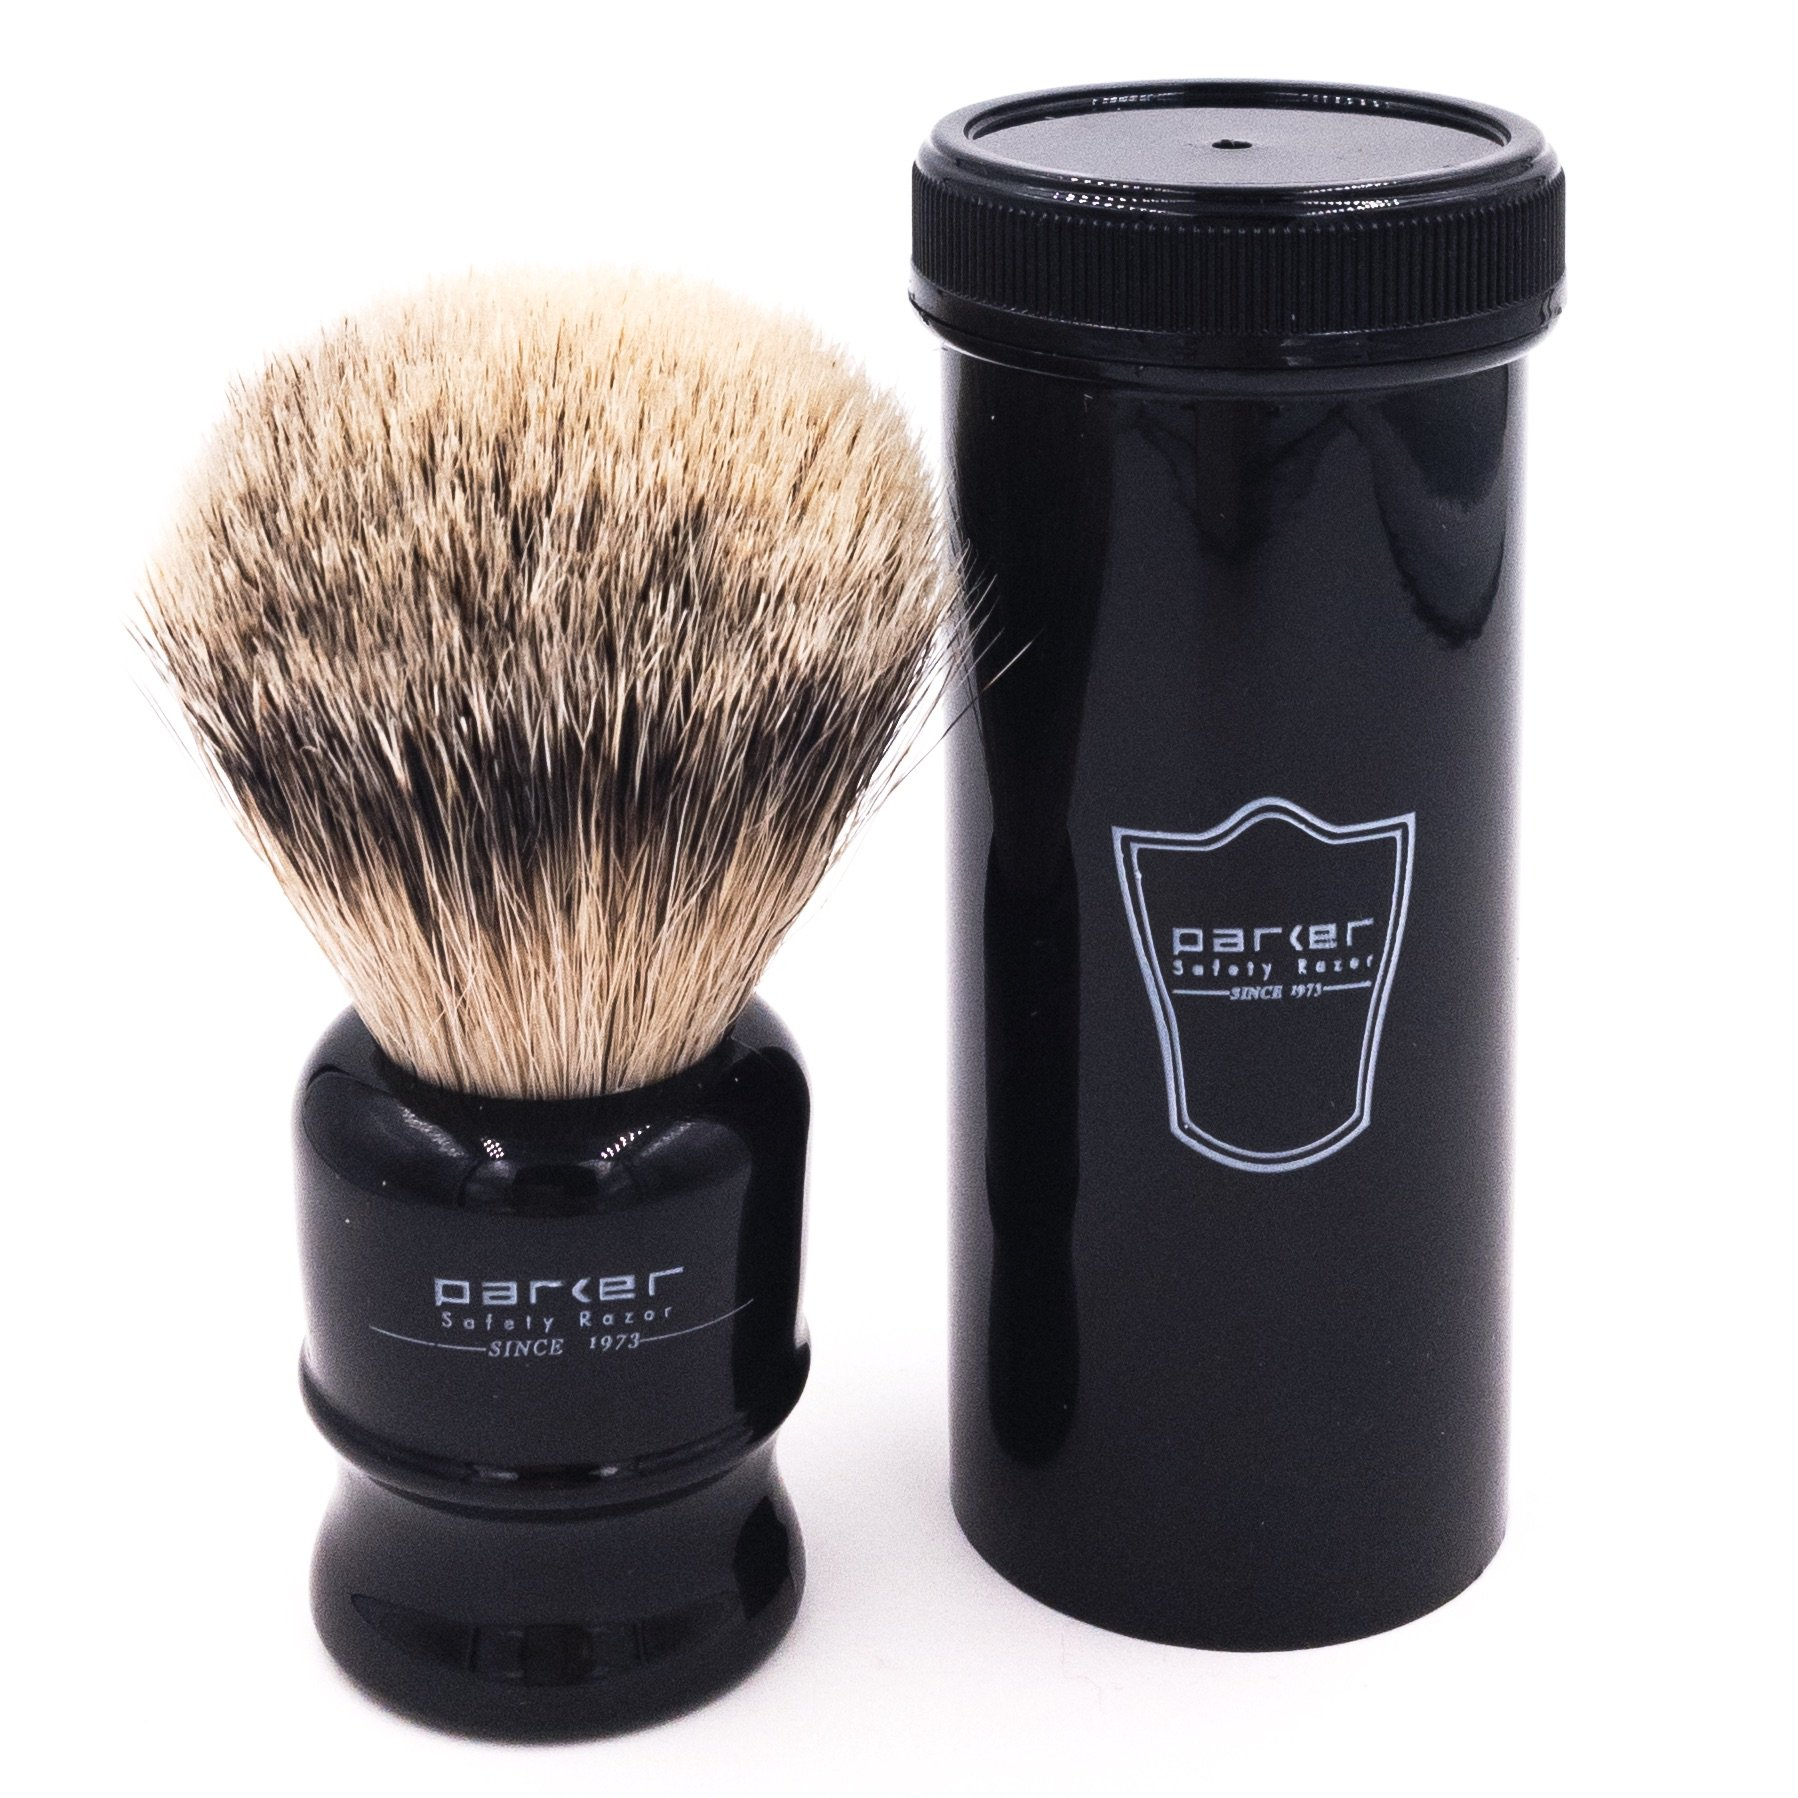 Parker Safety Razor,100% Silvertip Travel Shave Brush with Case, Black by Parker Safety Razor